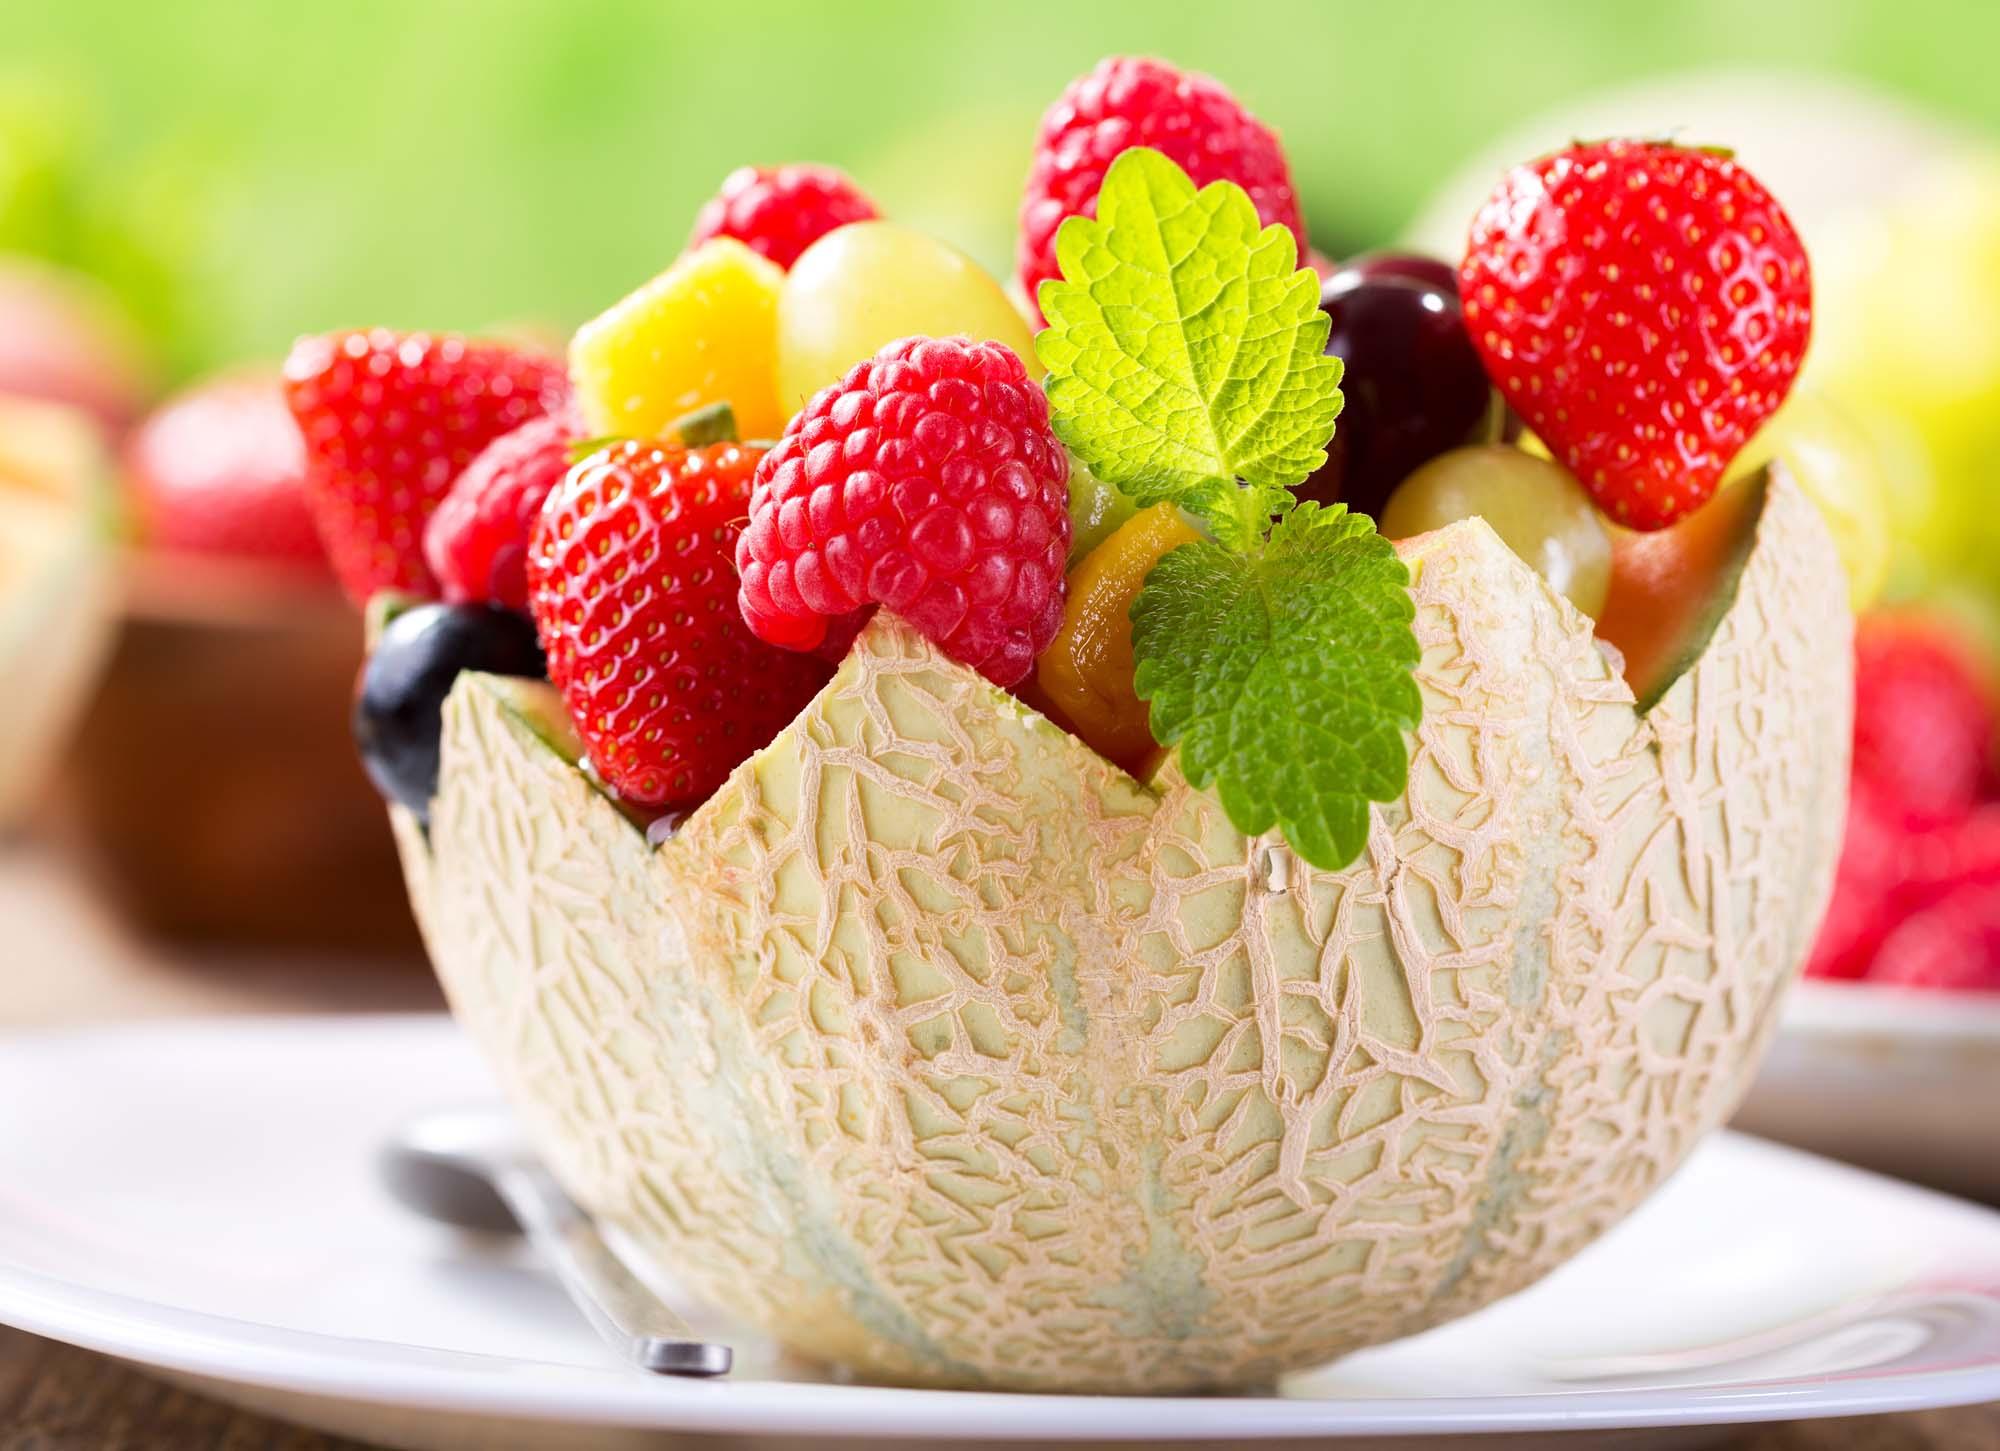 Melonskål med vindruer